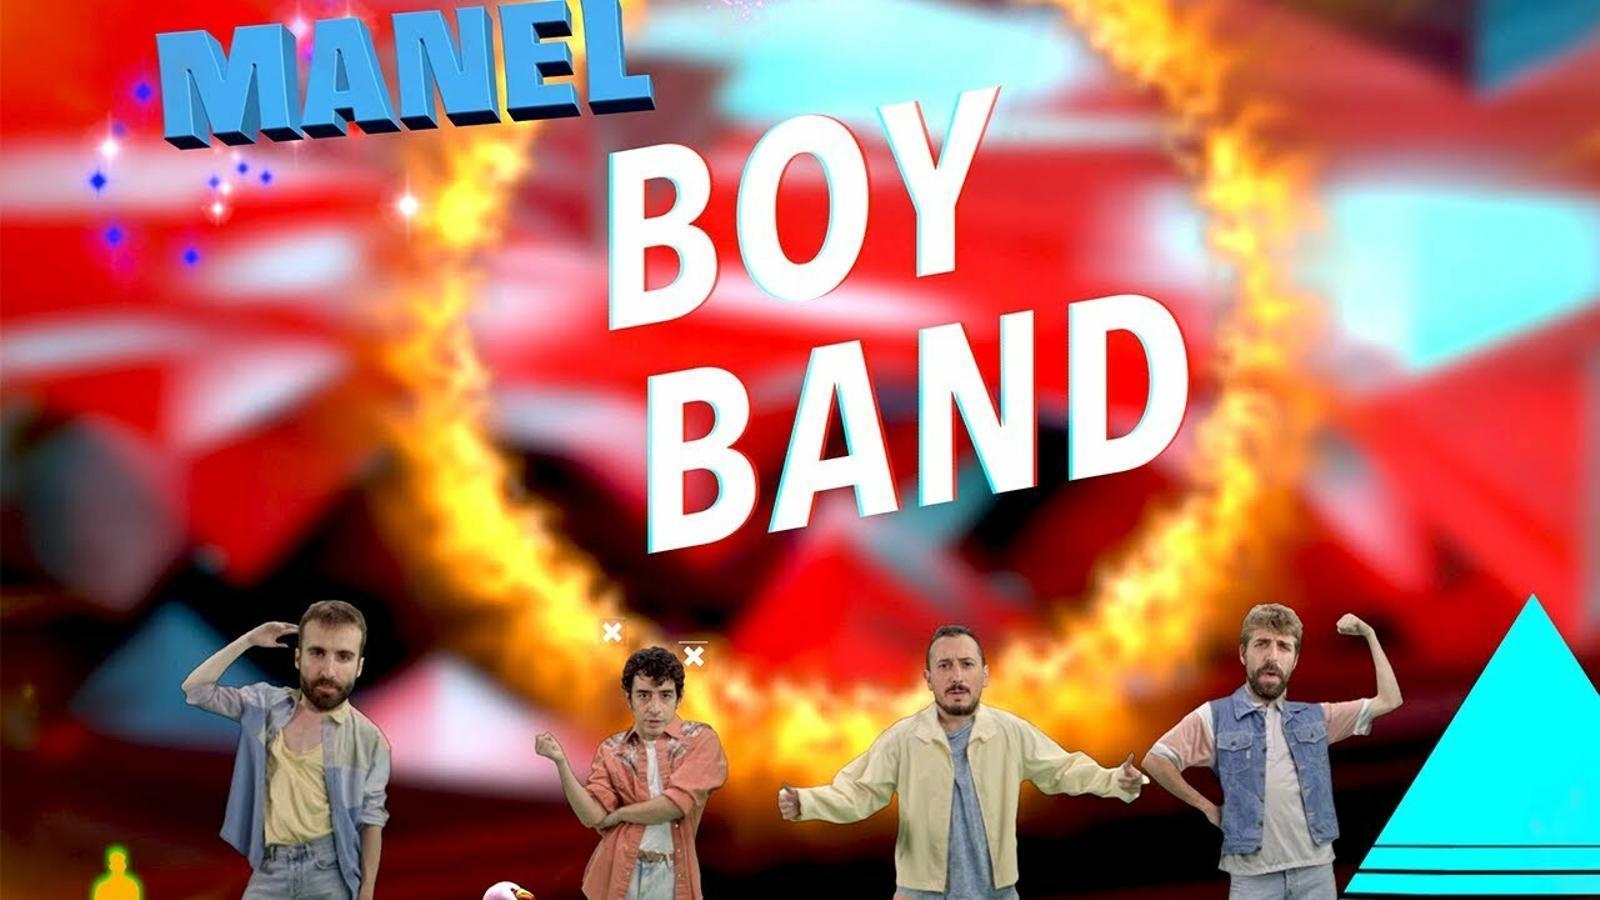 Manel, 'Boy band', videoclip